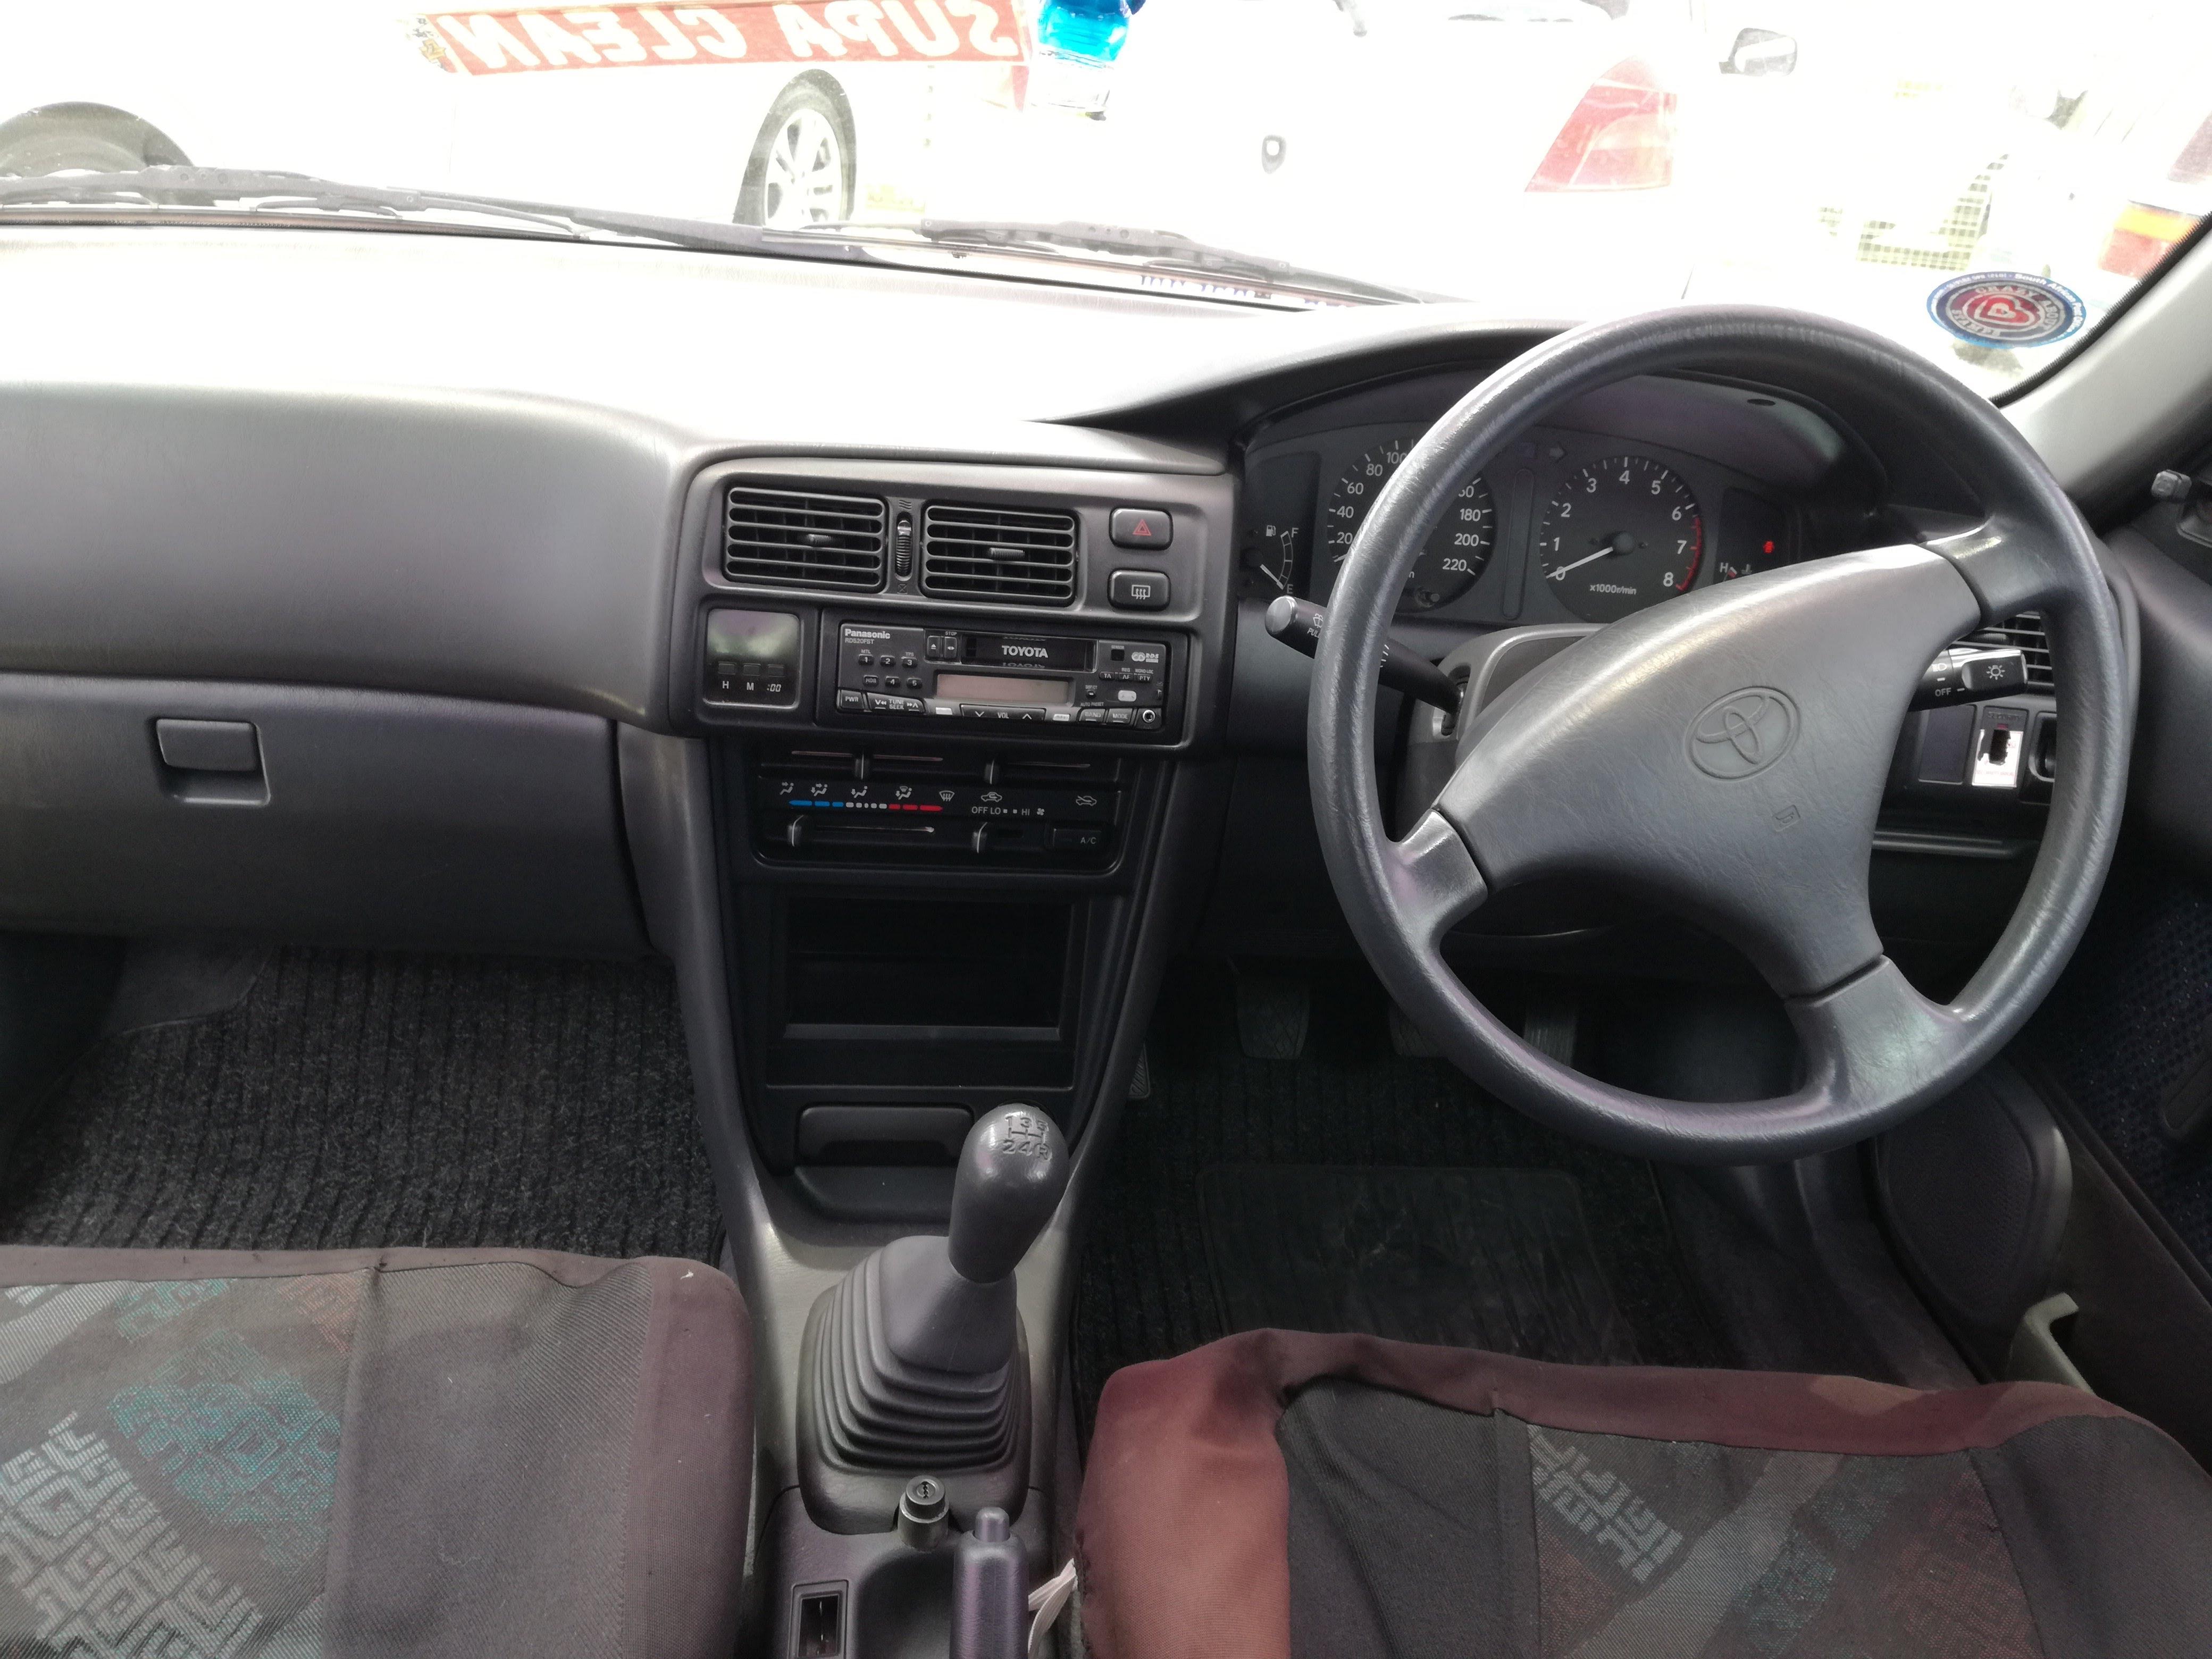 Toyota Corolla 1.6 GLE full